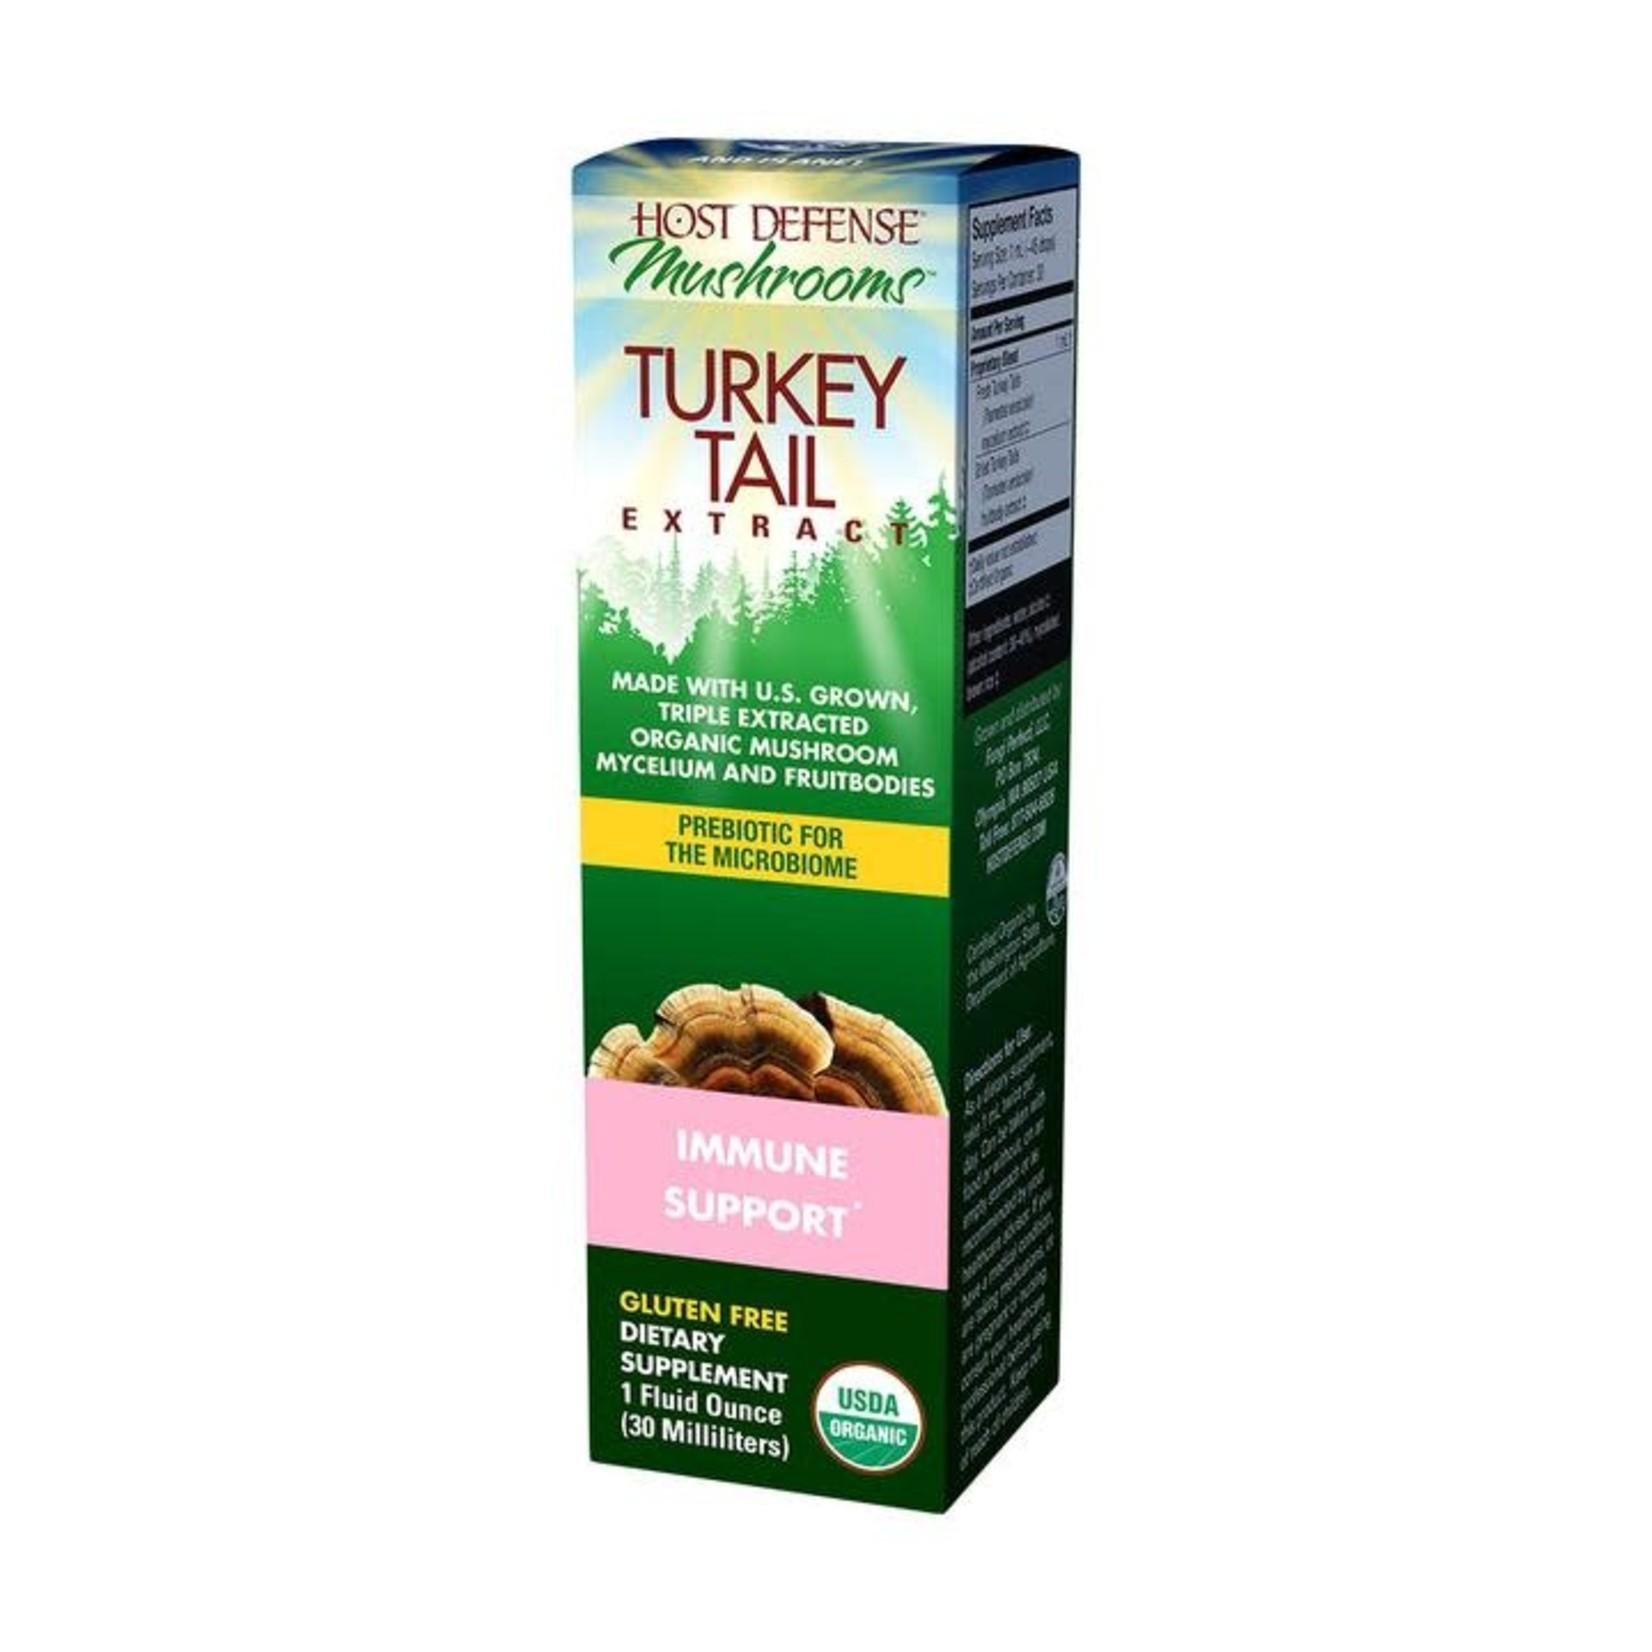 Host Defense HD Turkey Tail Mushroom Extract